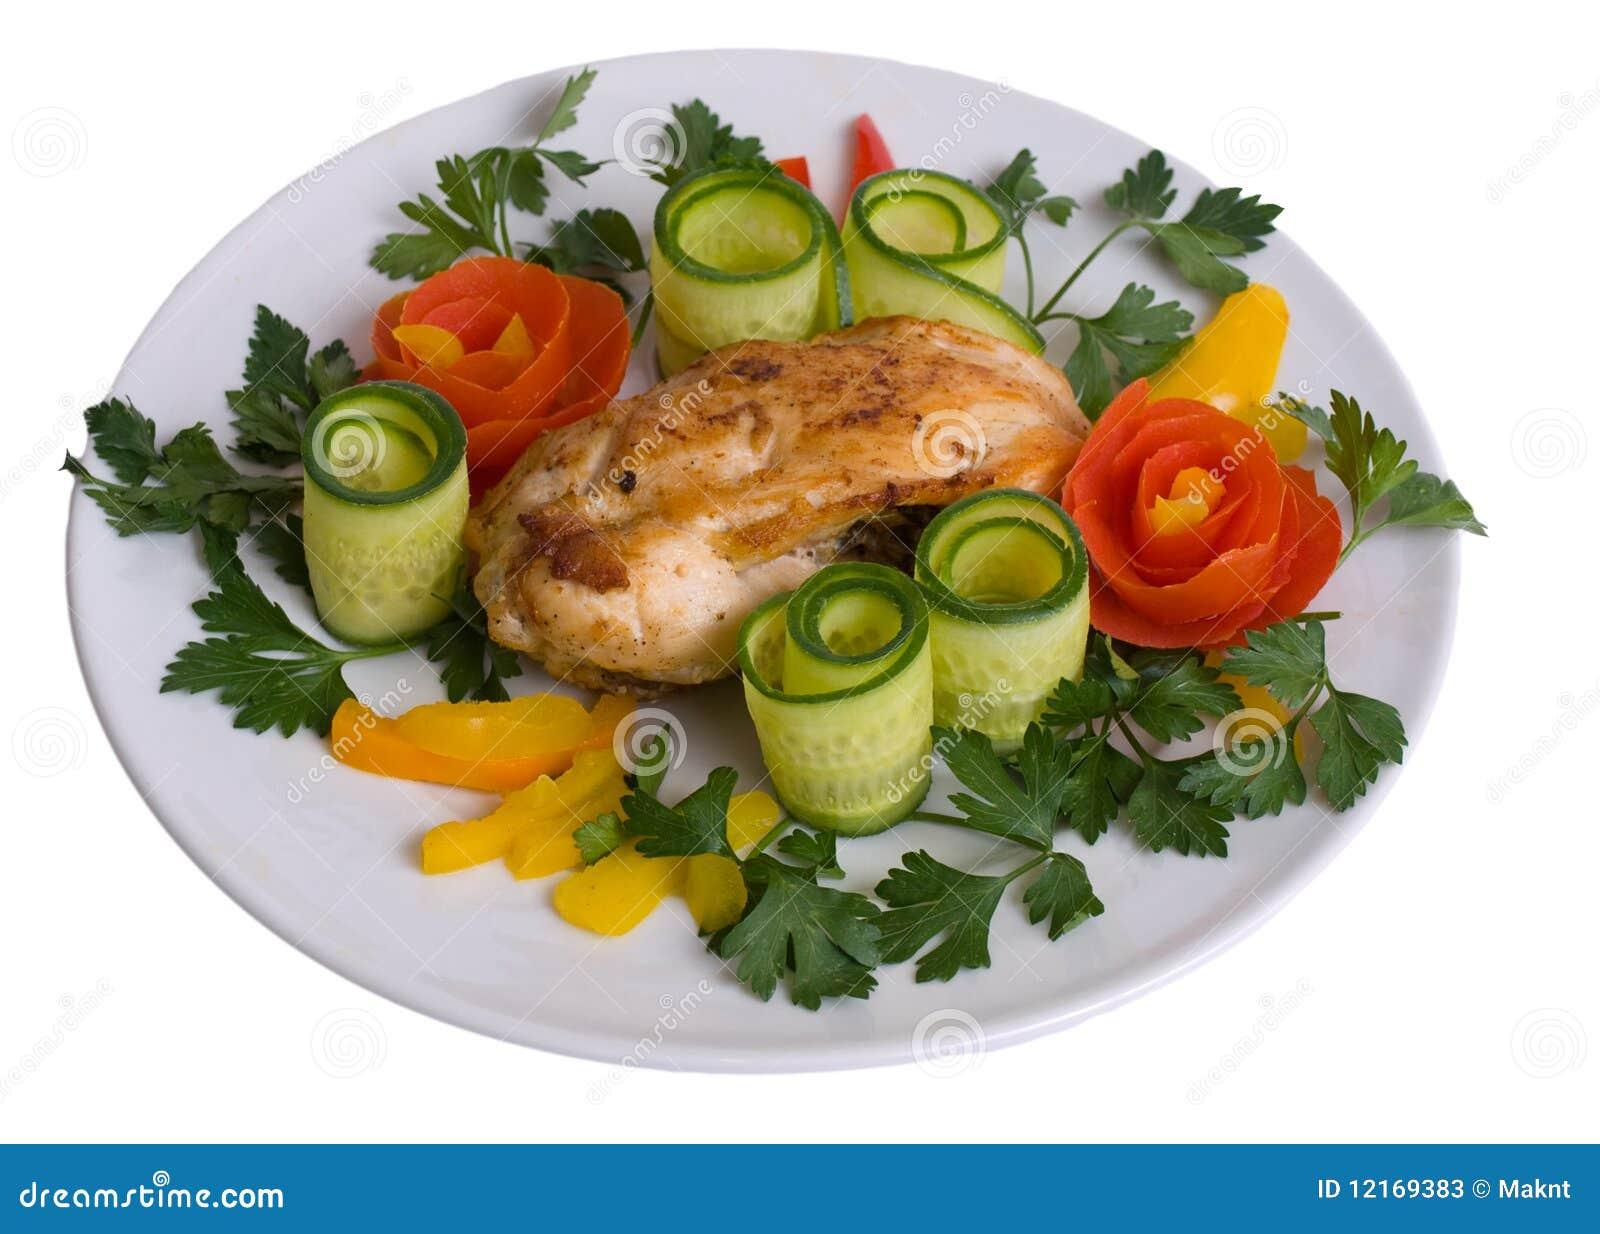 Roast Chicken Stock Photos - Image: 12169383